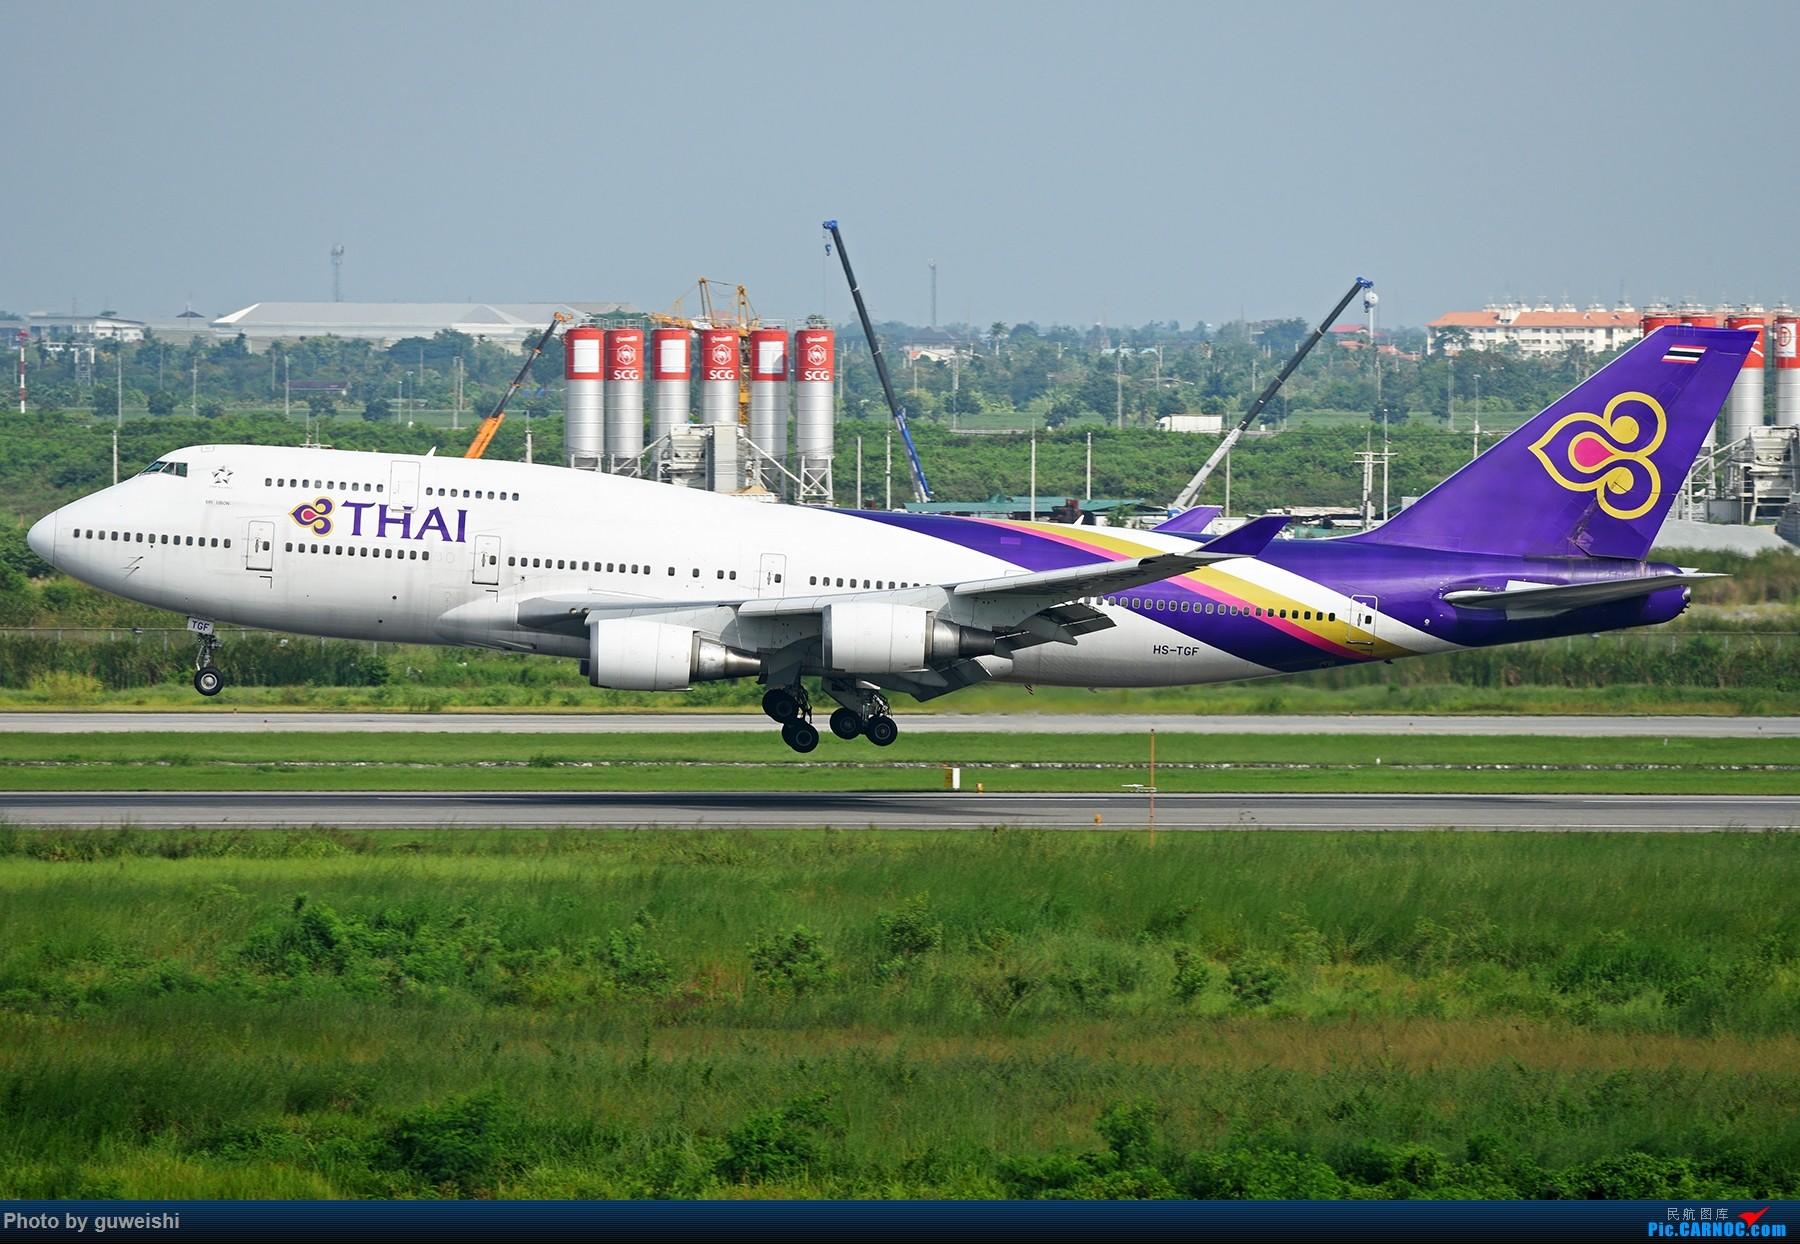 Re:[原创]【早师傅出品】——这是一架才冲出跑道的飞机 BOEING 747-400 HS-TGF 泰国曼谷素万那普国际机场